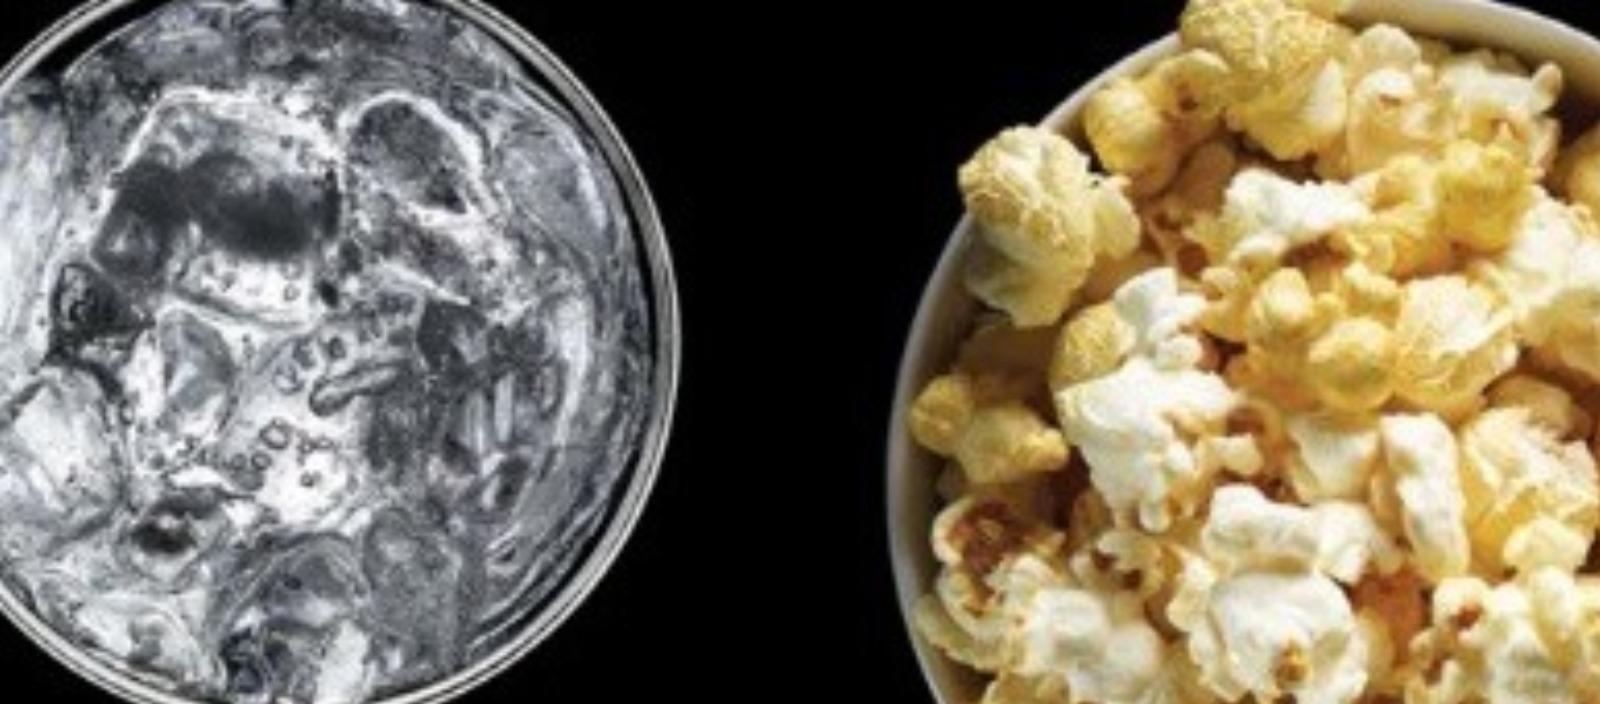 Odeon Cinemas launch new VIP Gallery menu popcorn